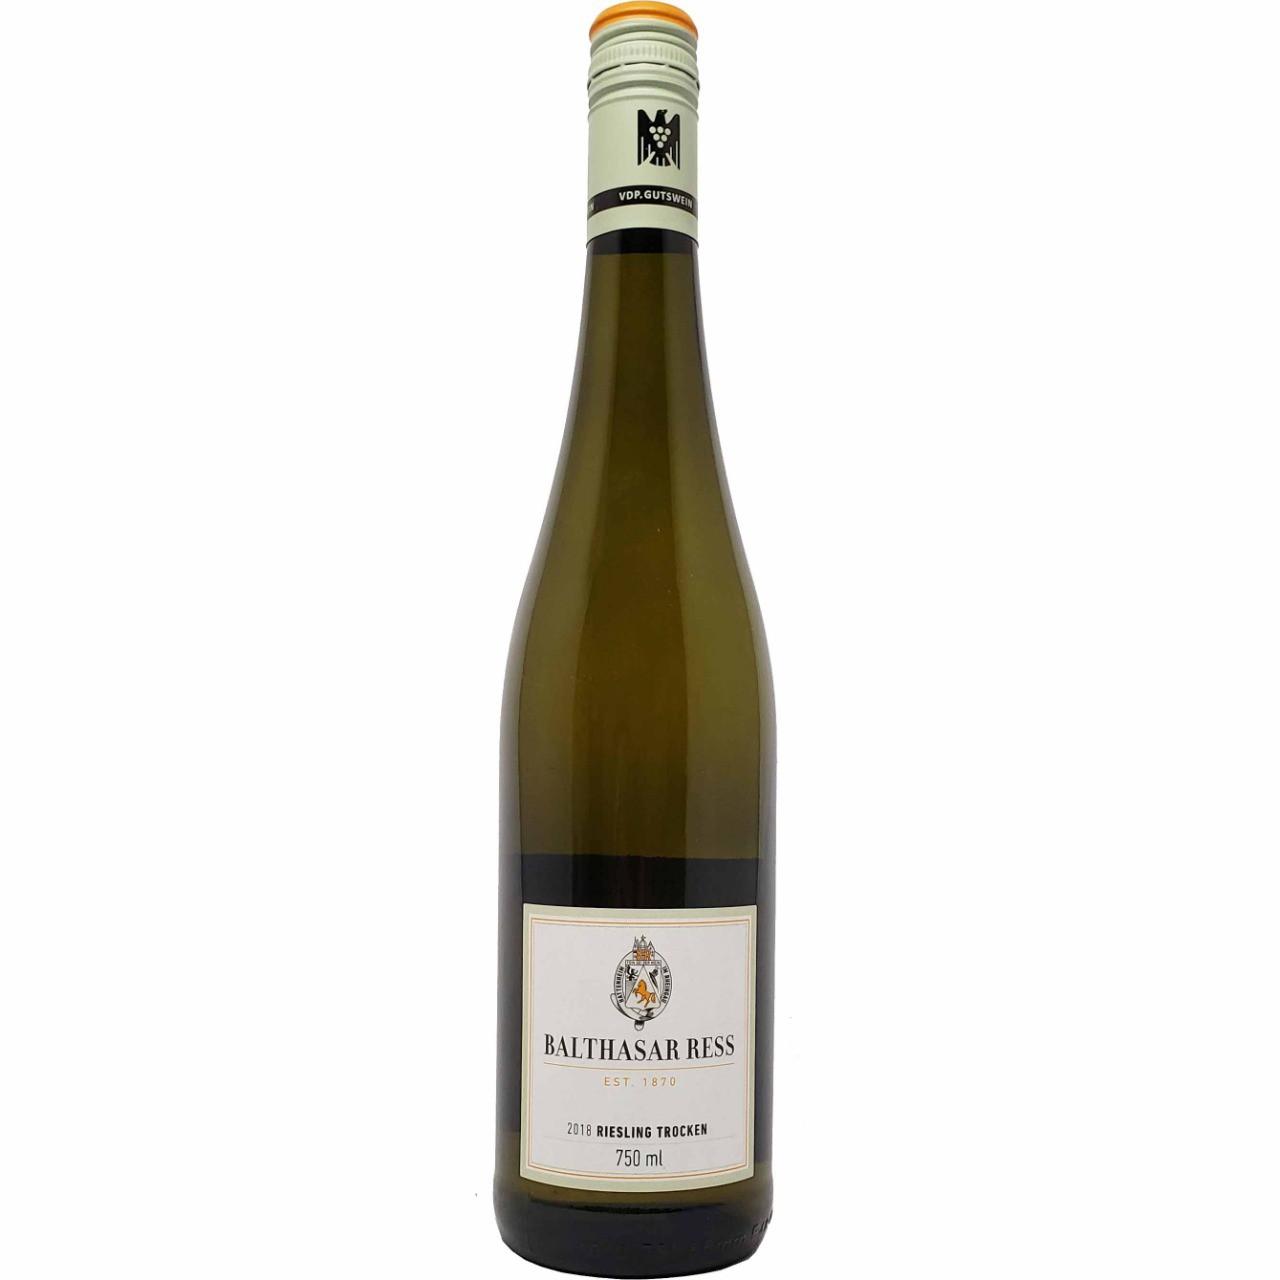 Vinho Branco Balthasar Ress Riesling Trocken - 750ml -